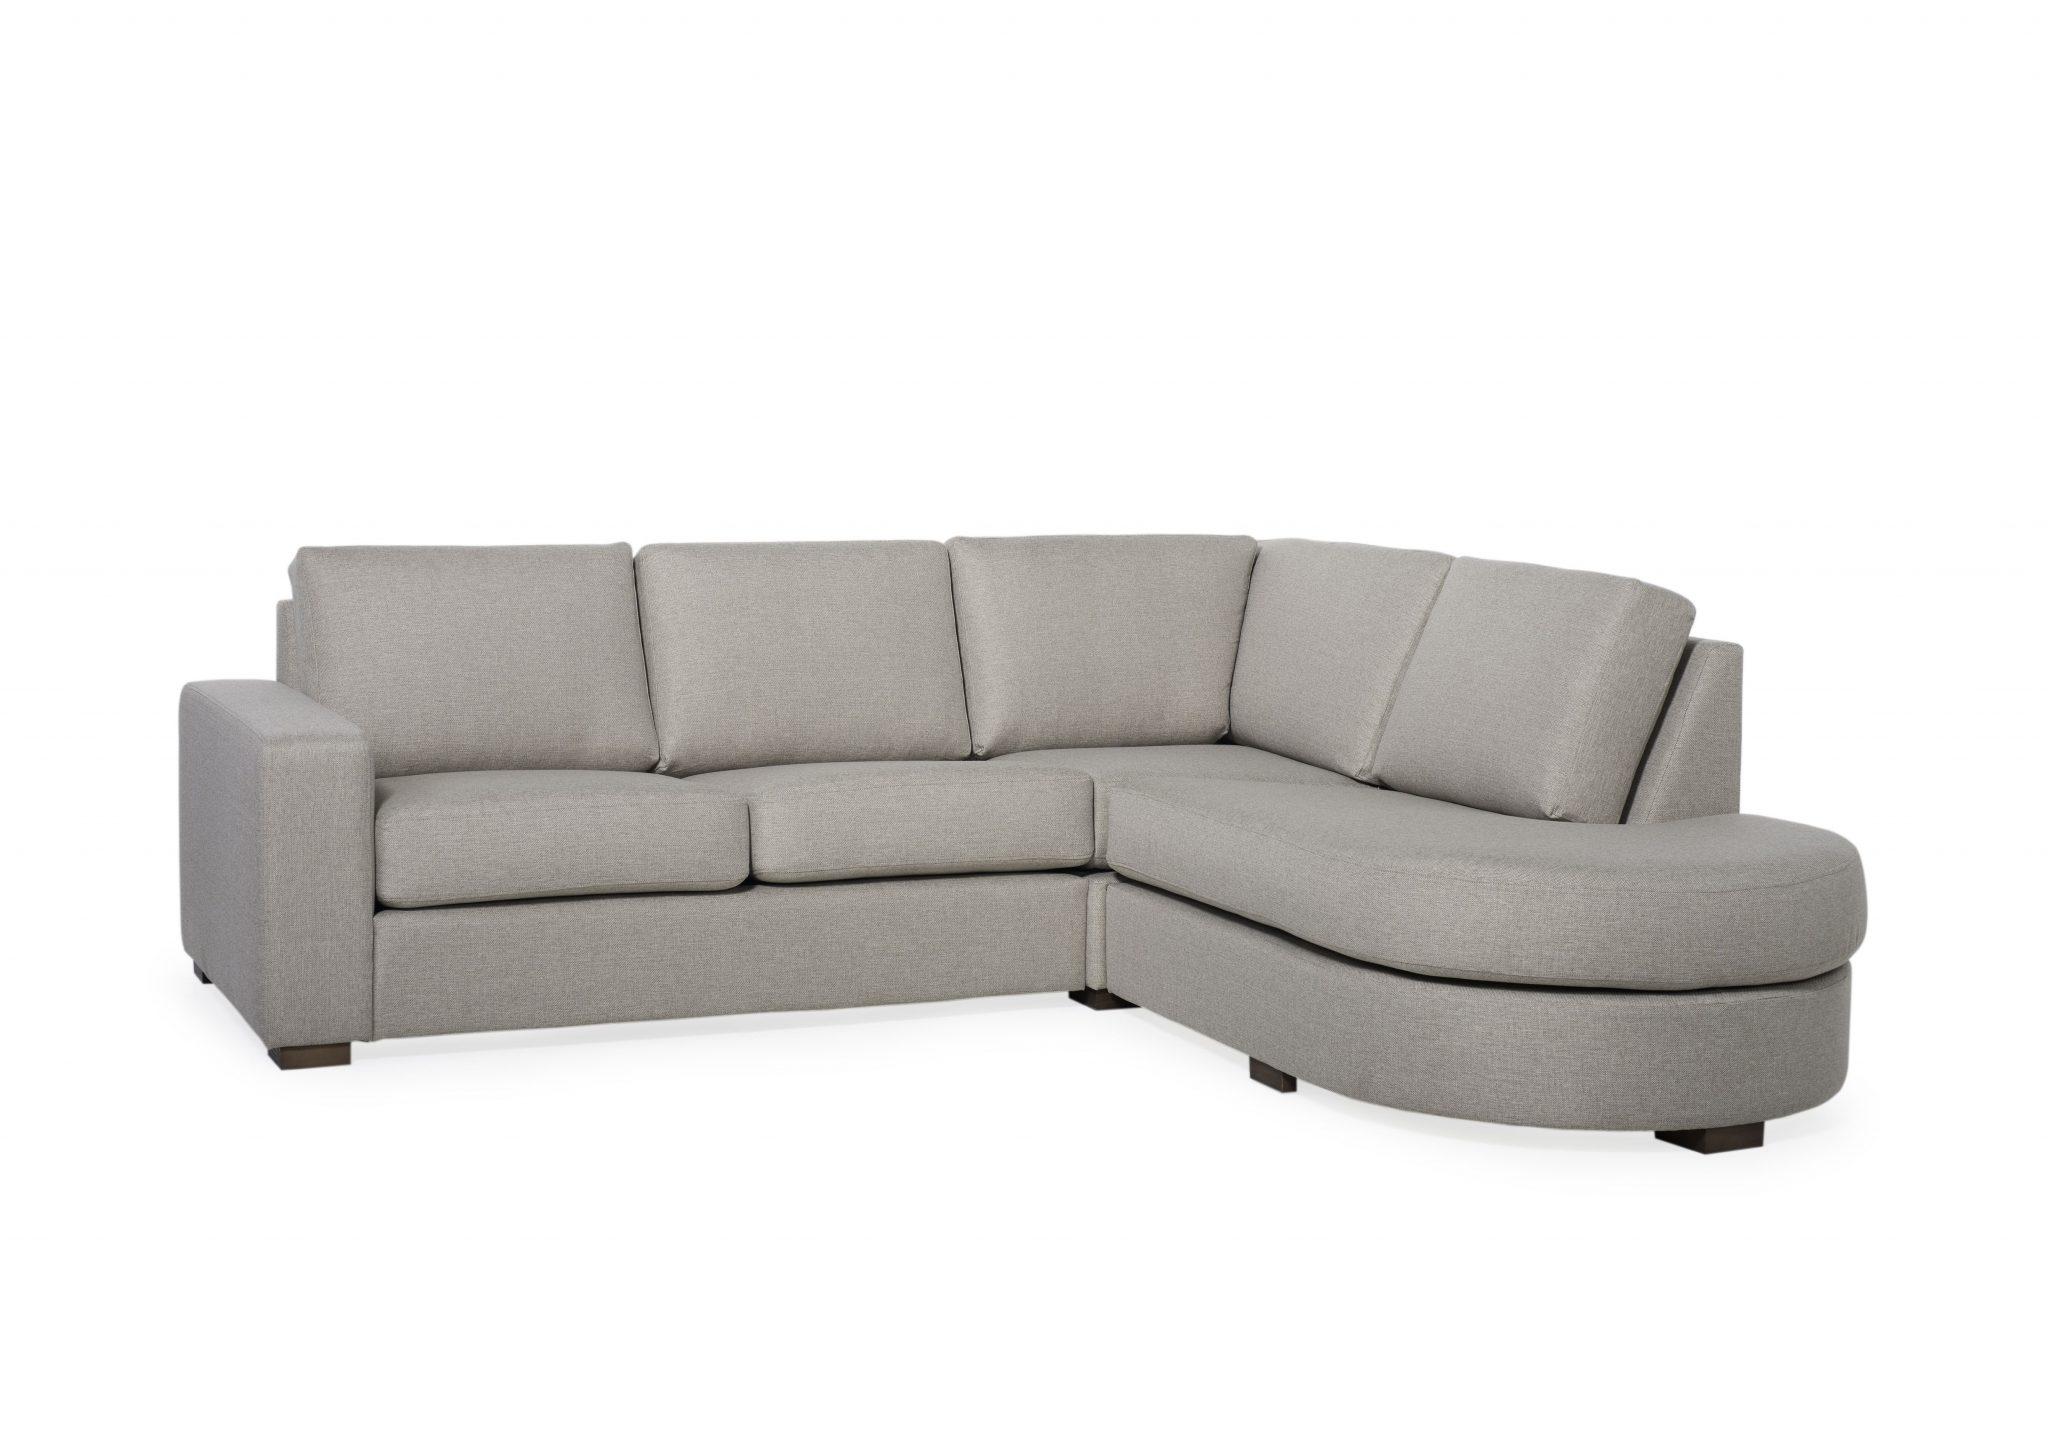 Modern Living Room Sofa Lamp Scandinavian Interior Design Furniture ...